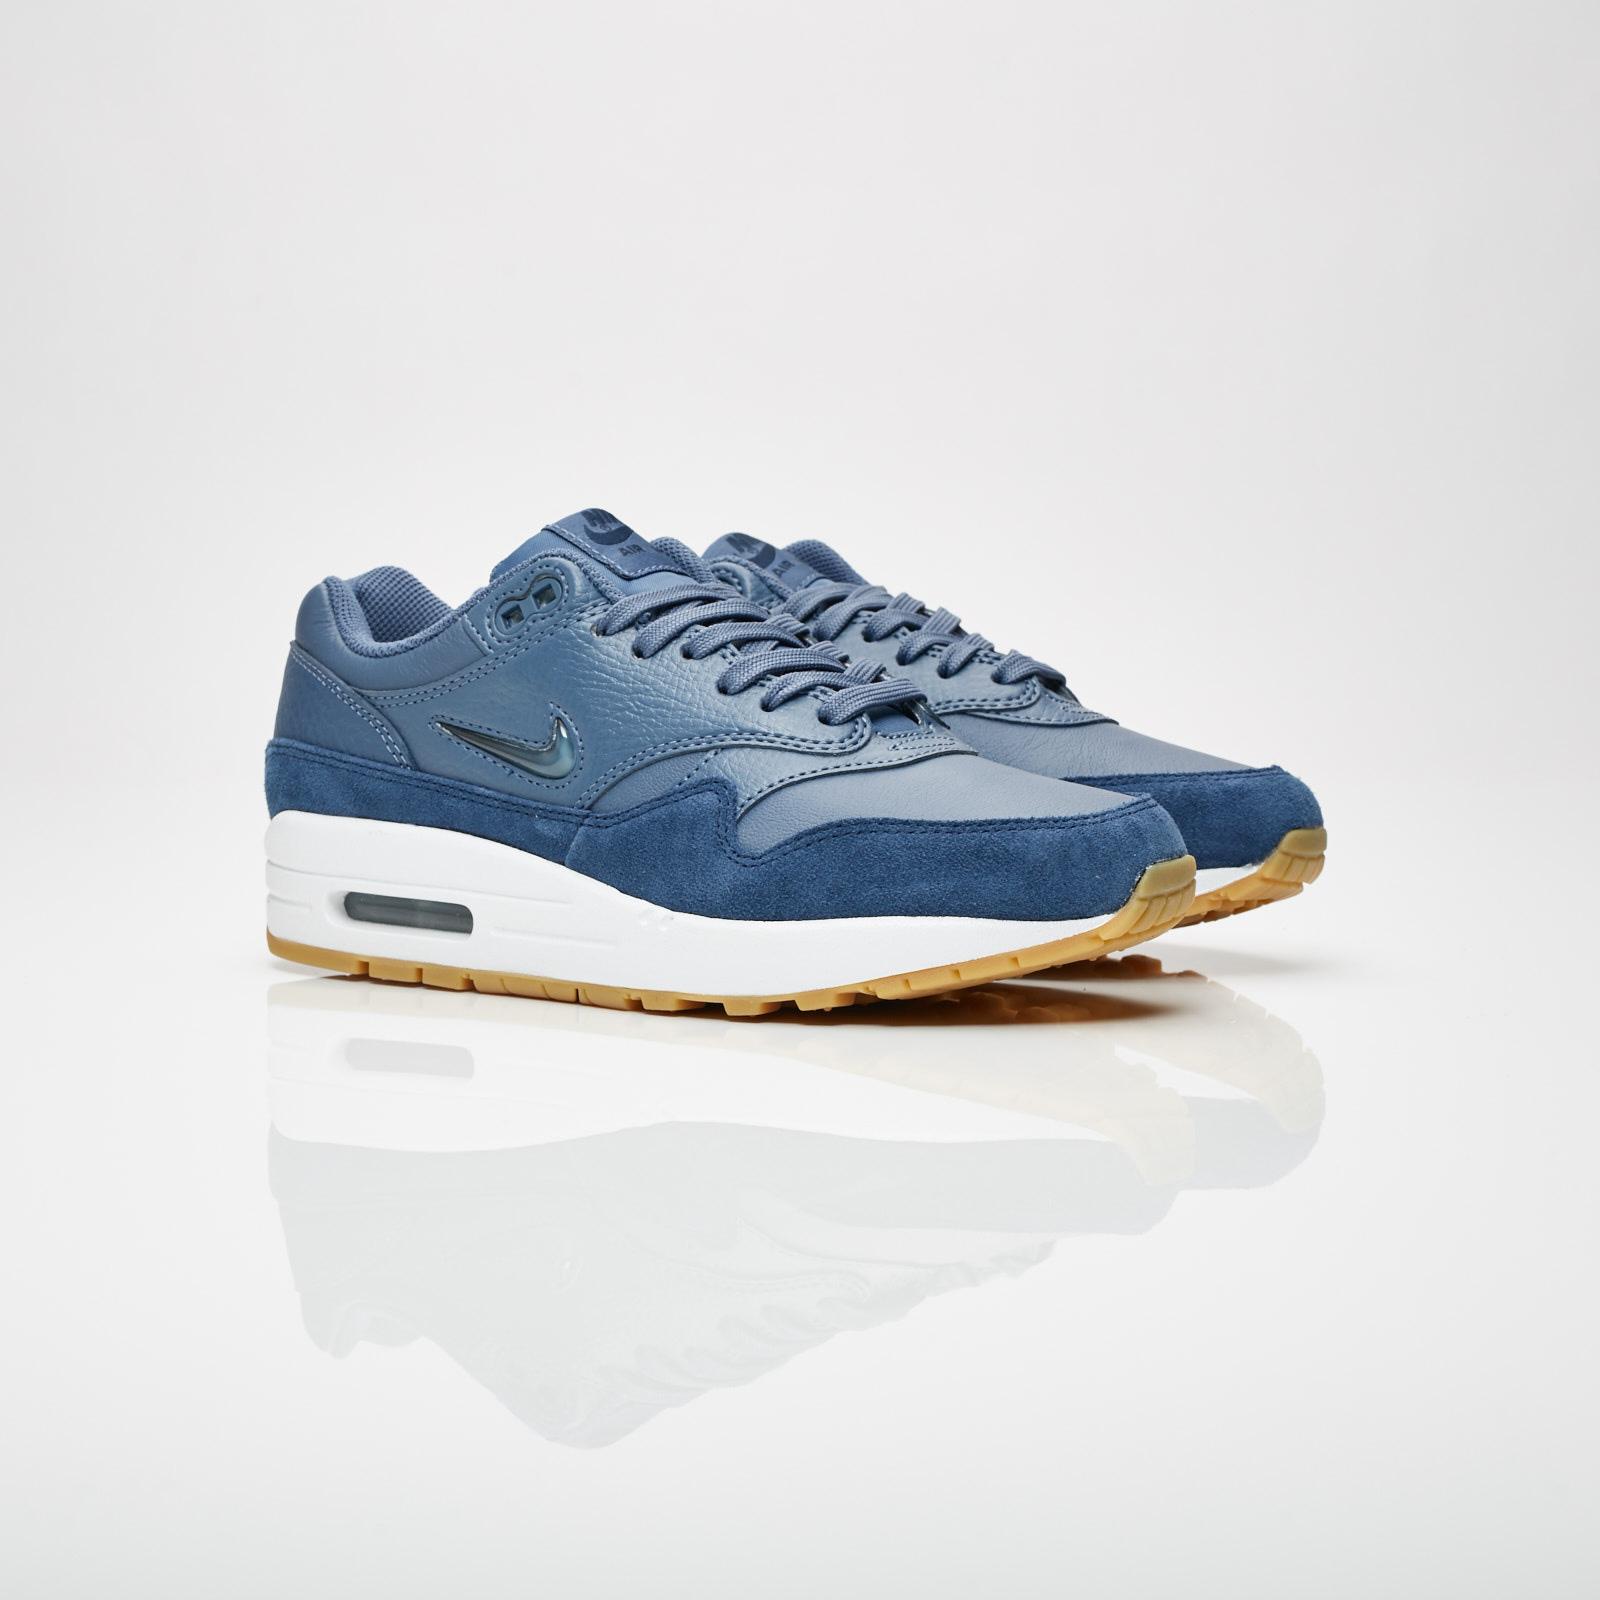 size 40 7f932 52484 Nike Sportswear Wmns Air Max 1 Premium SC